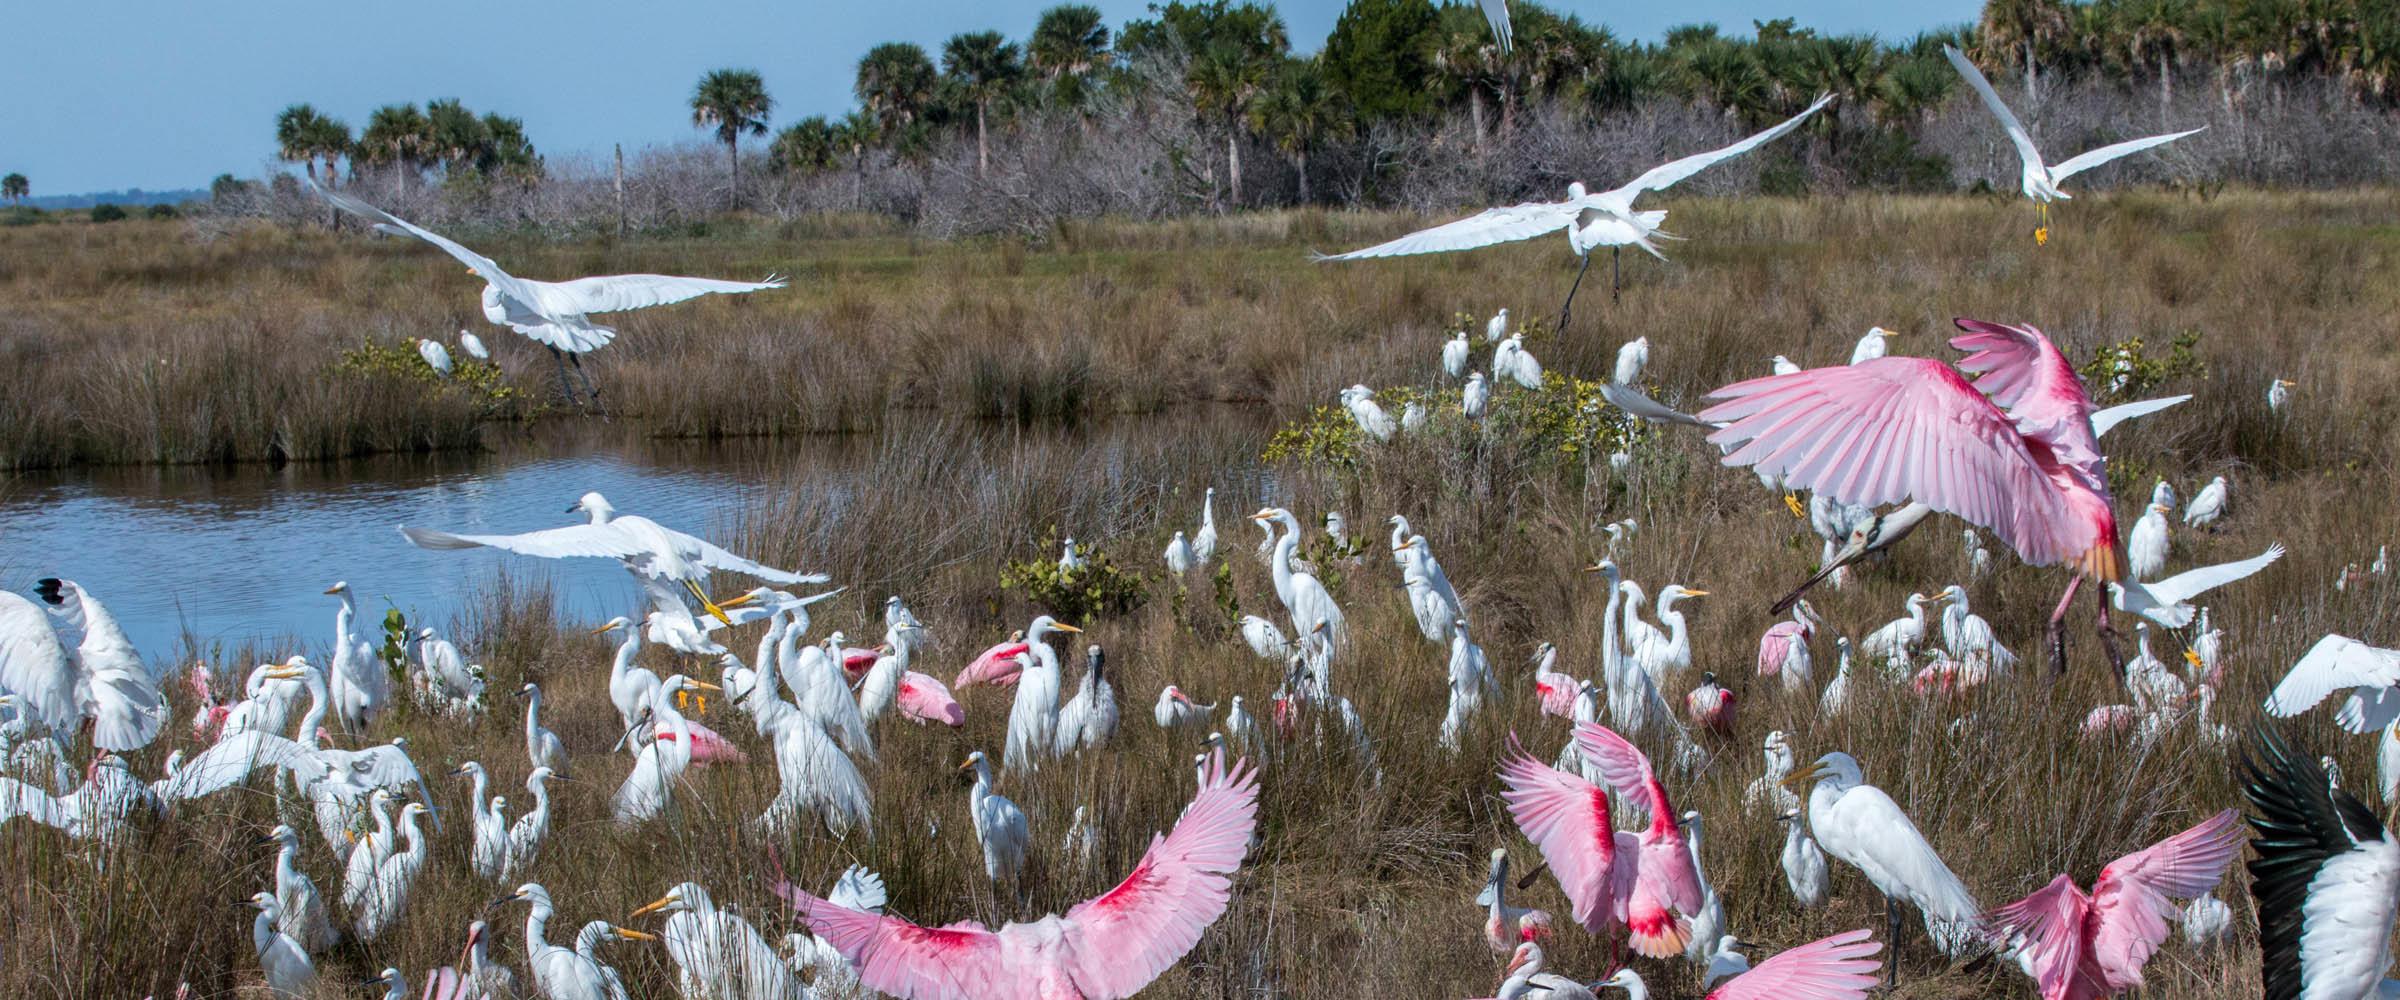 Wading birds.